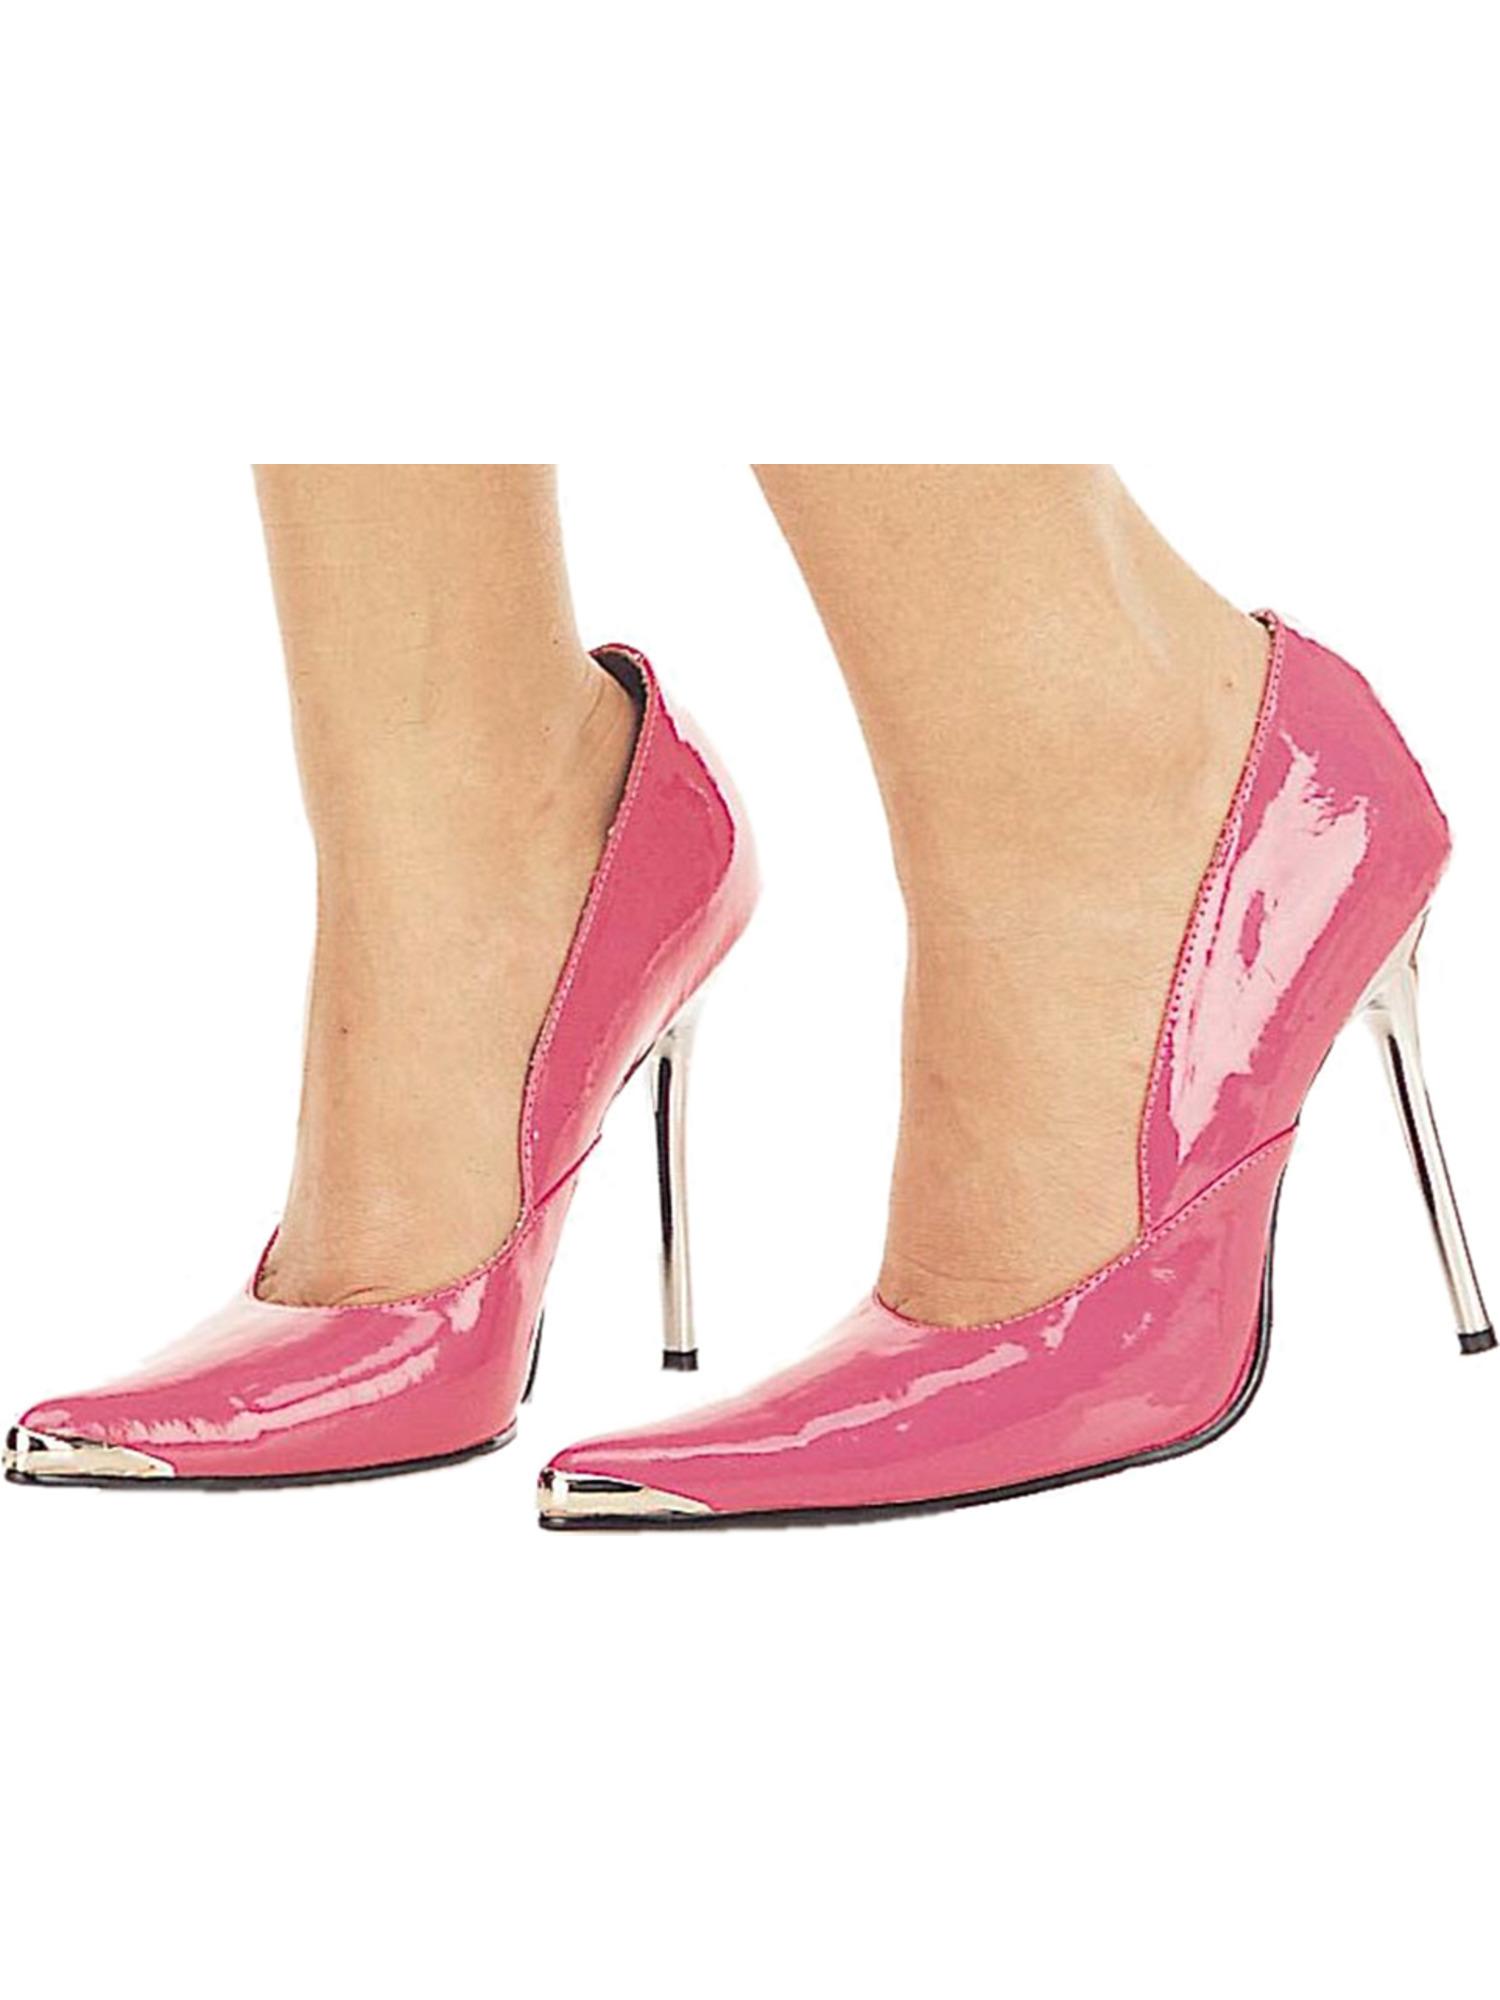 Womens Pink Pumps 4 1/2 Inch Heels